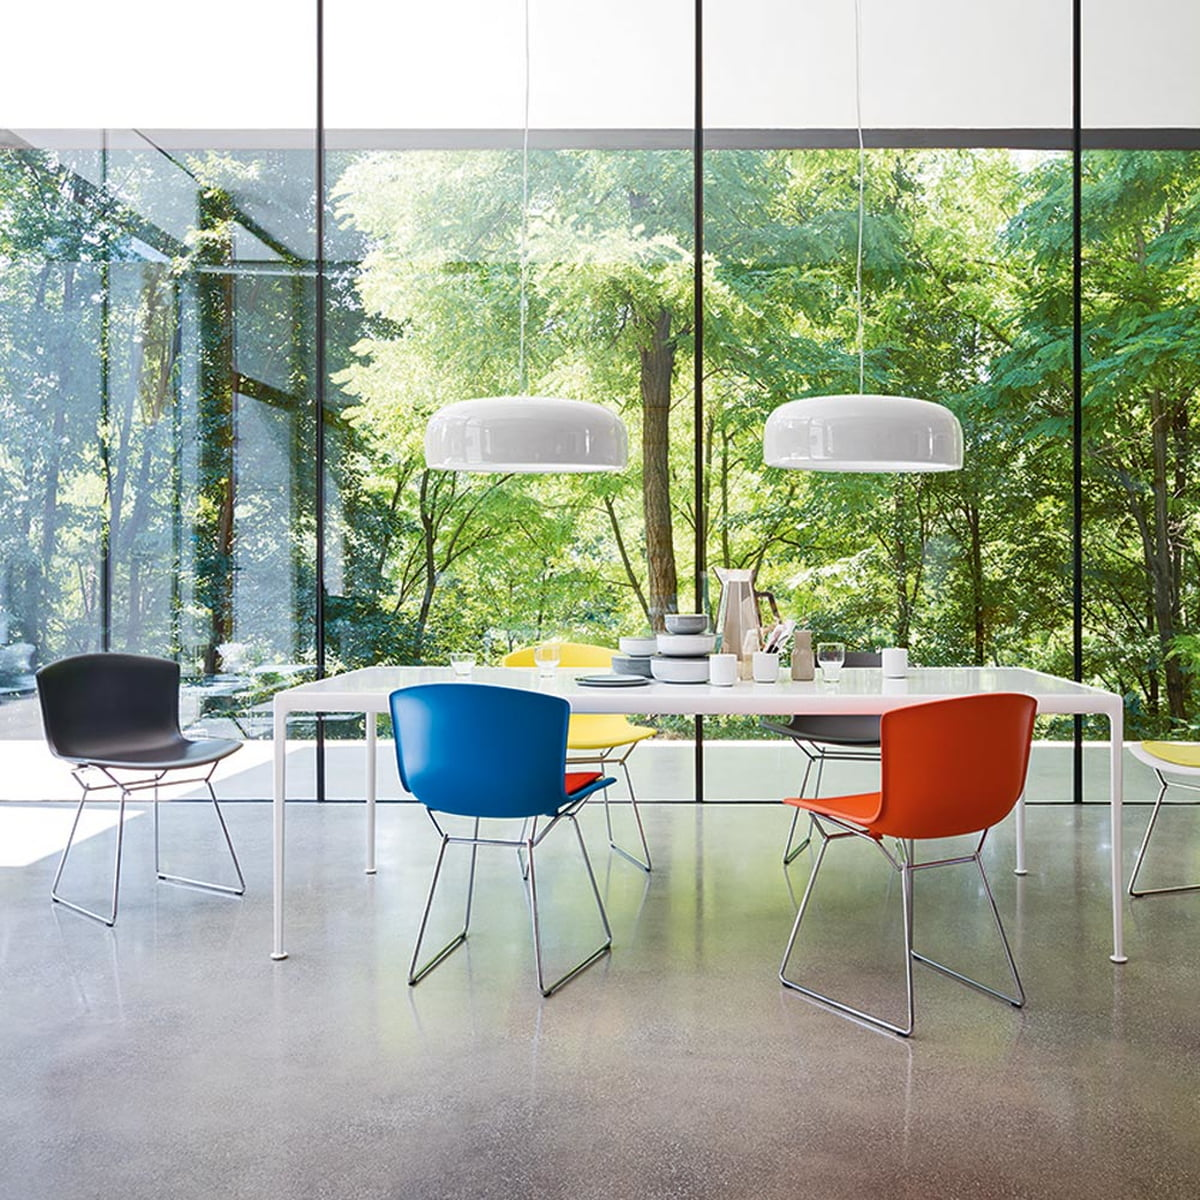 Obegi Home Furniture Knoll Bertoia Plastic Chairs Ambiente